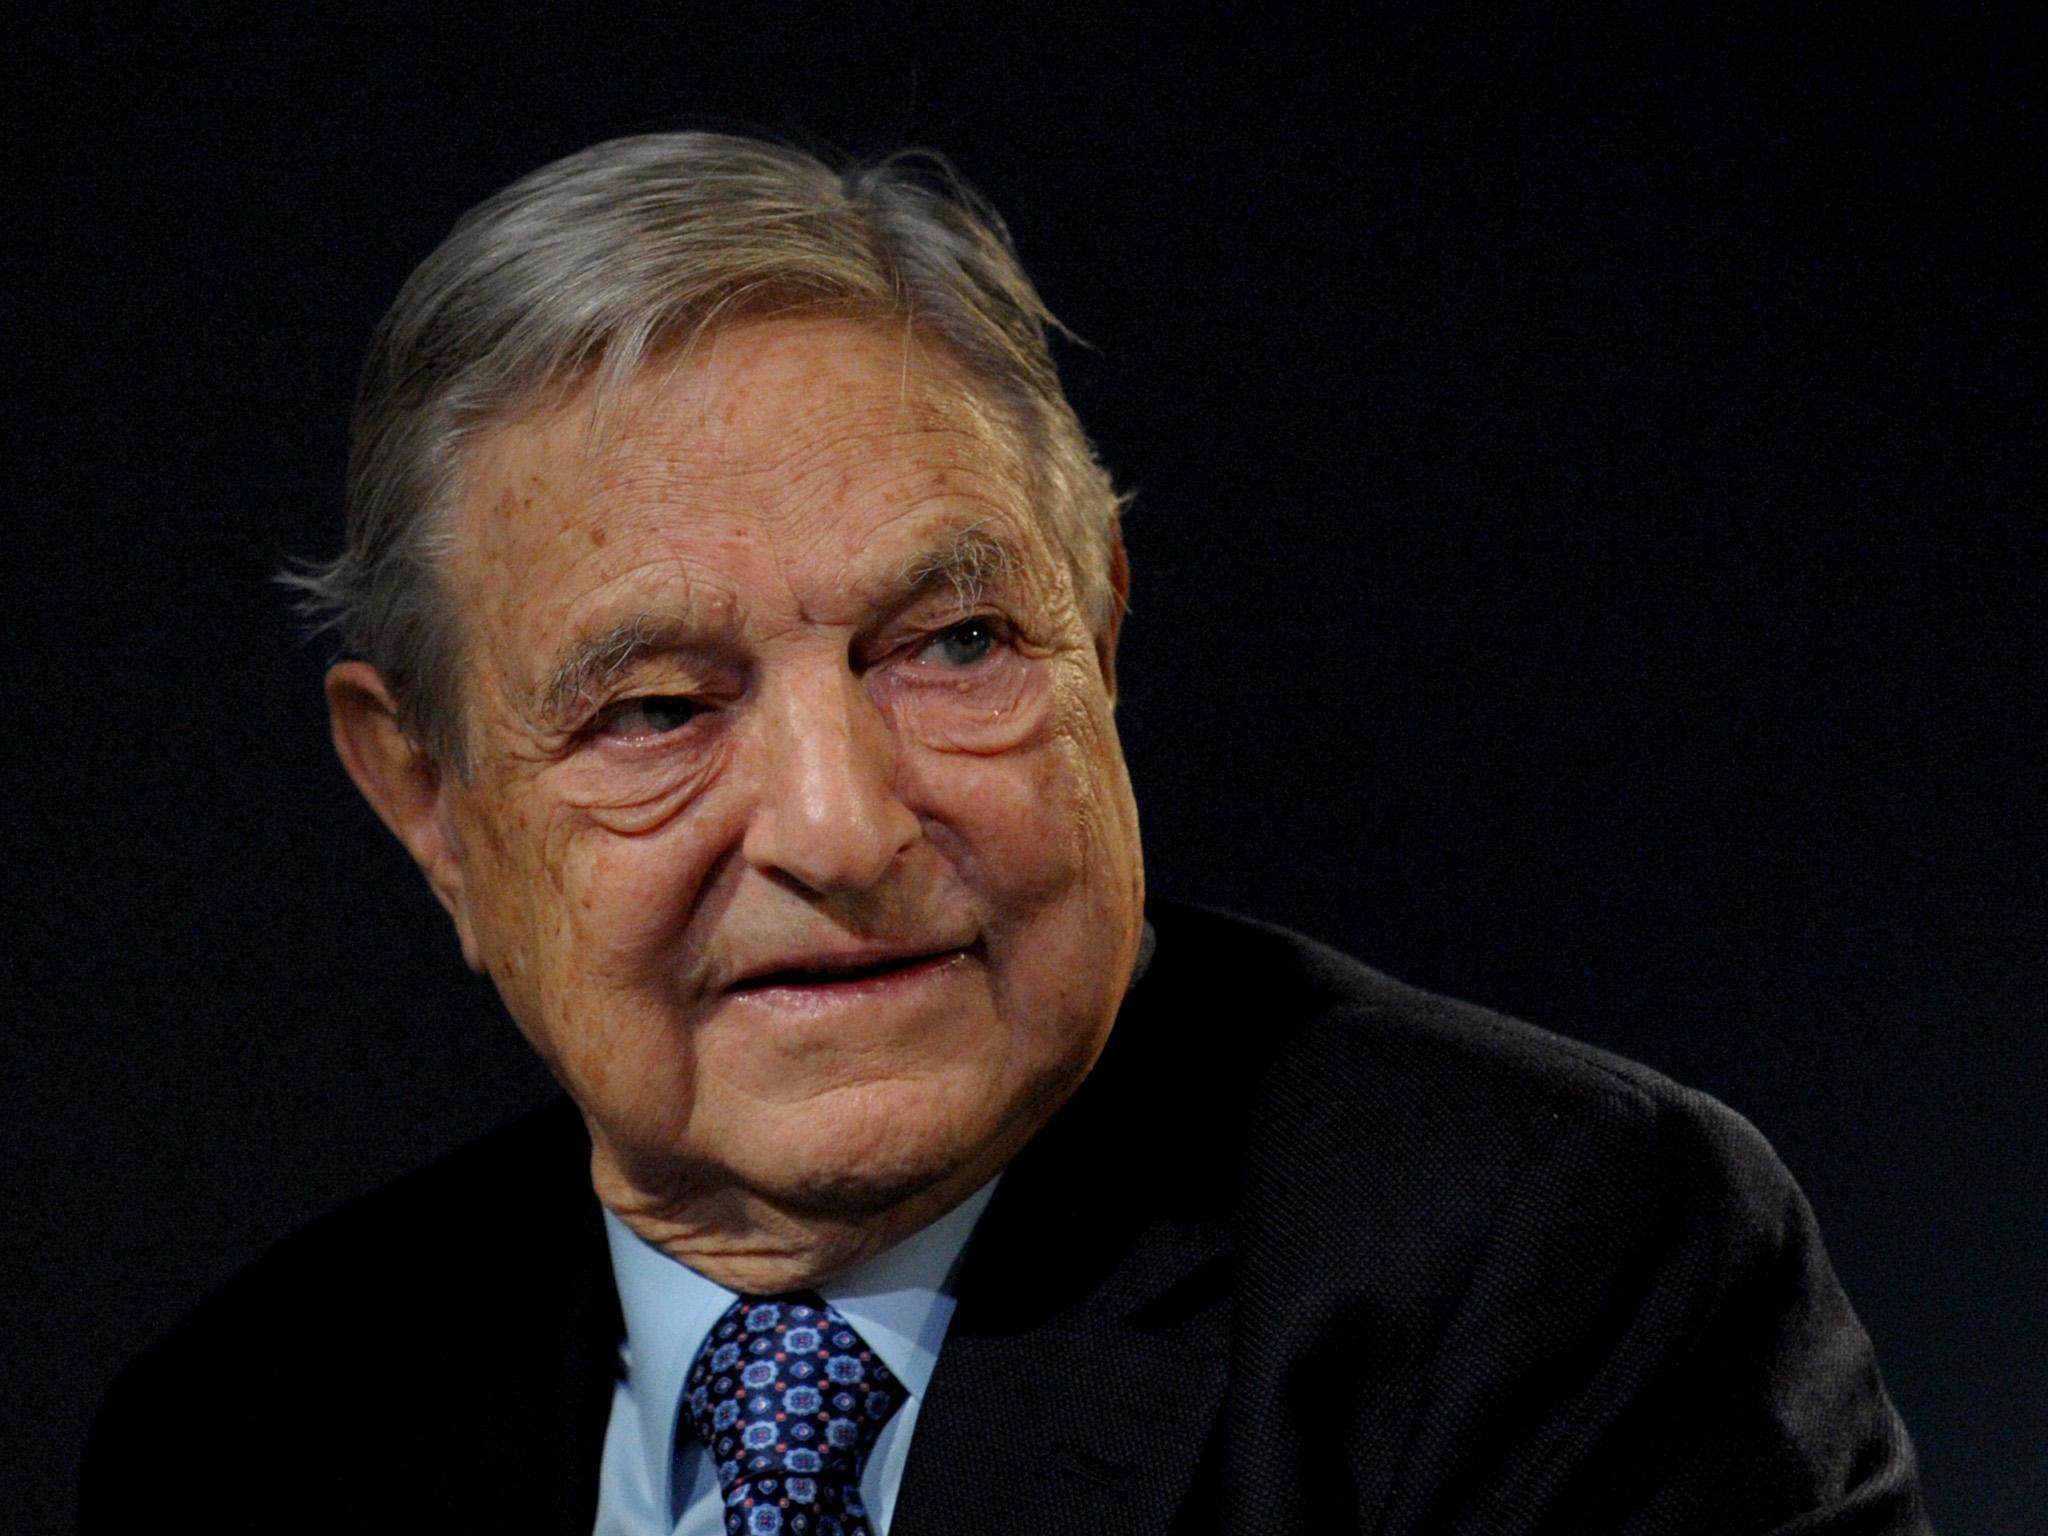 George Soros interview: Coronavirus endangers our civilisation